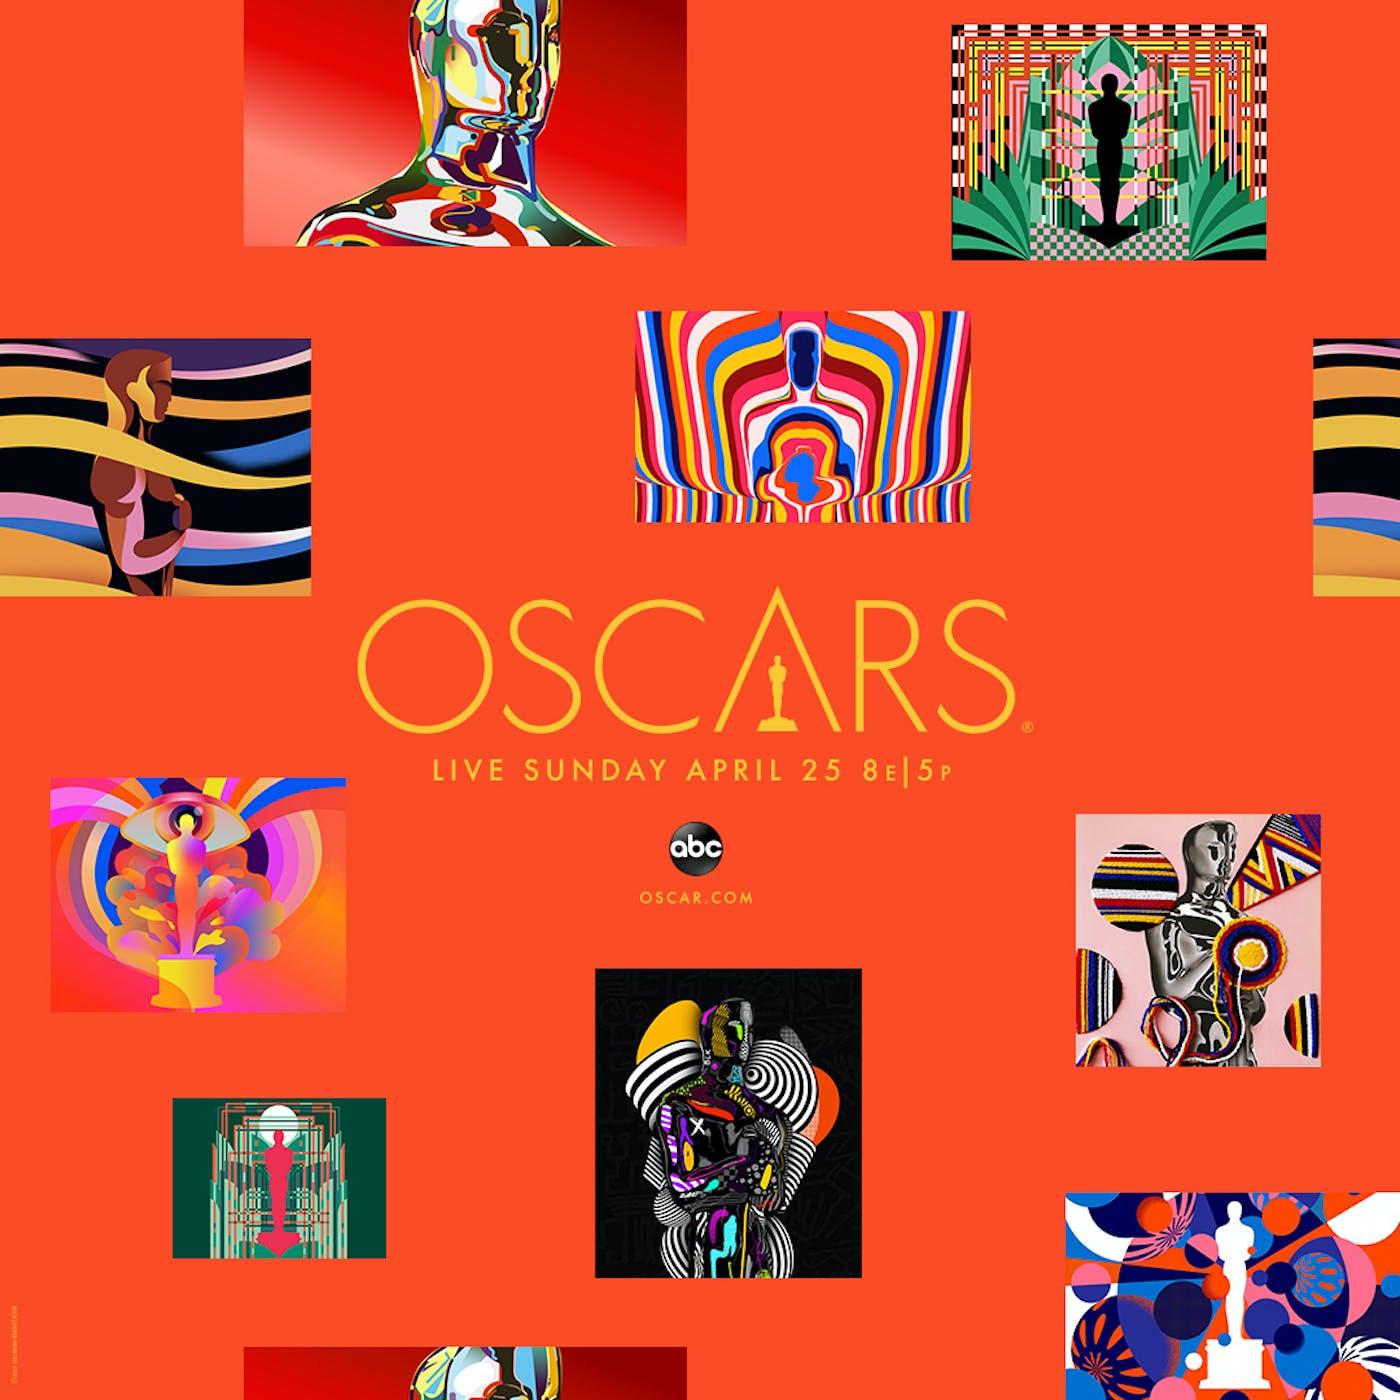 93 Oscars KA Poster Square 1080x1080 Orange